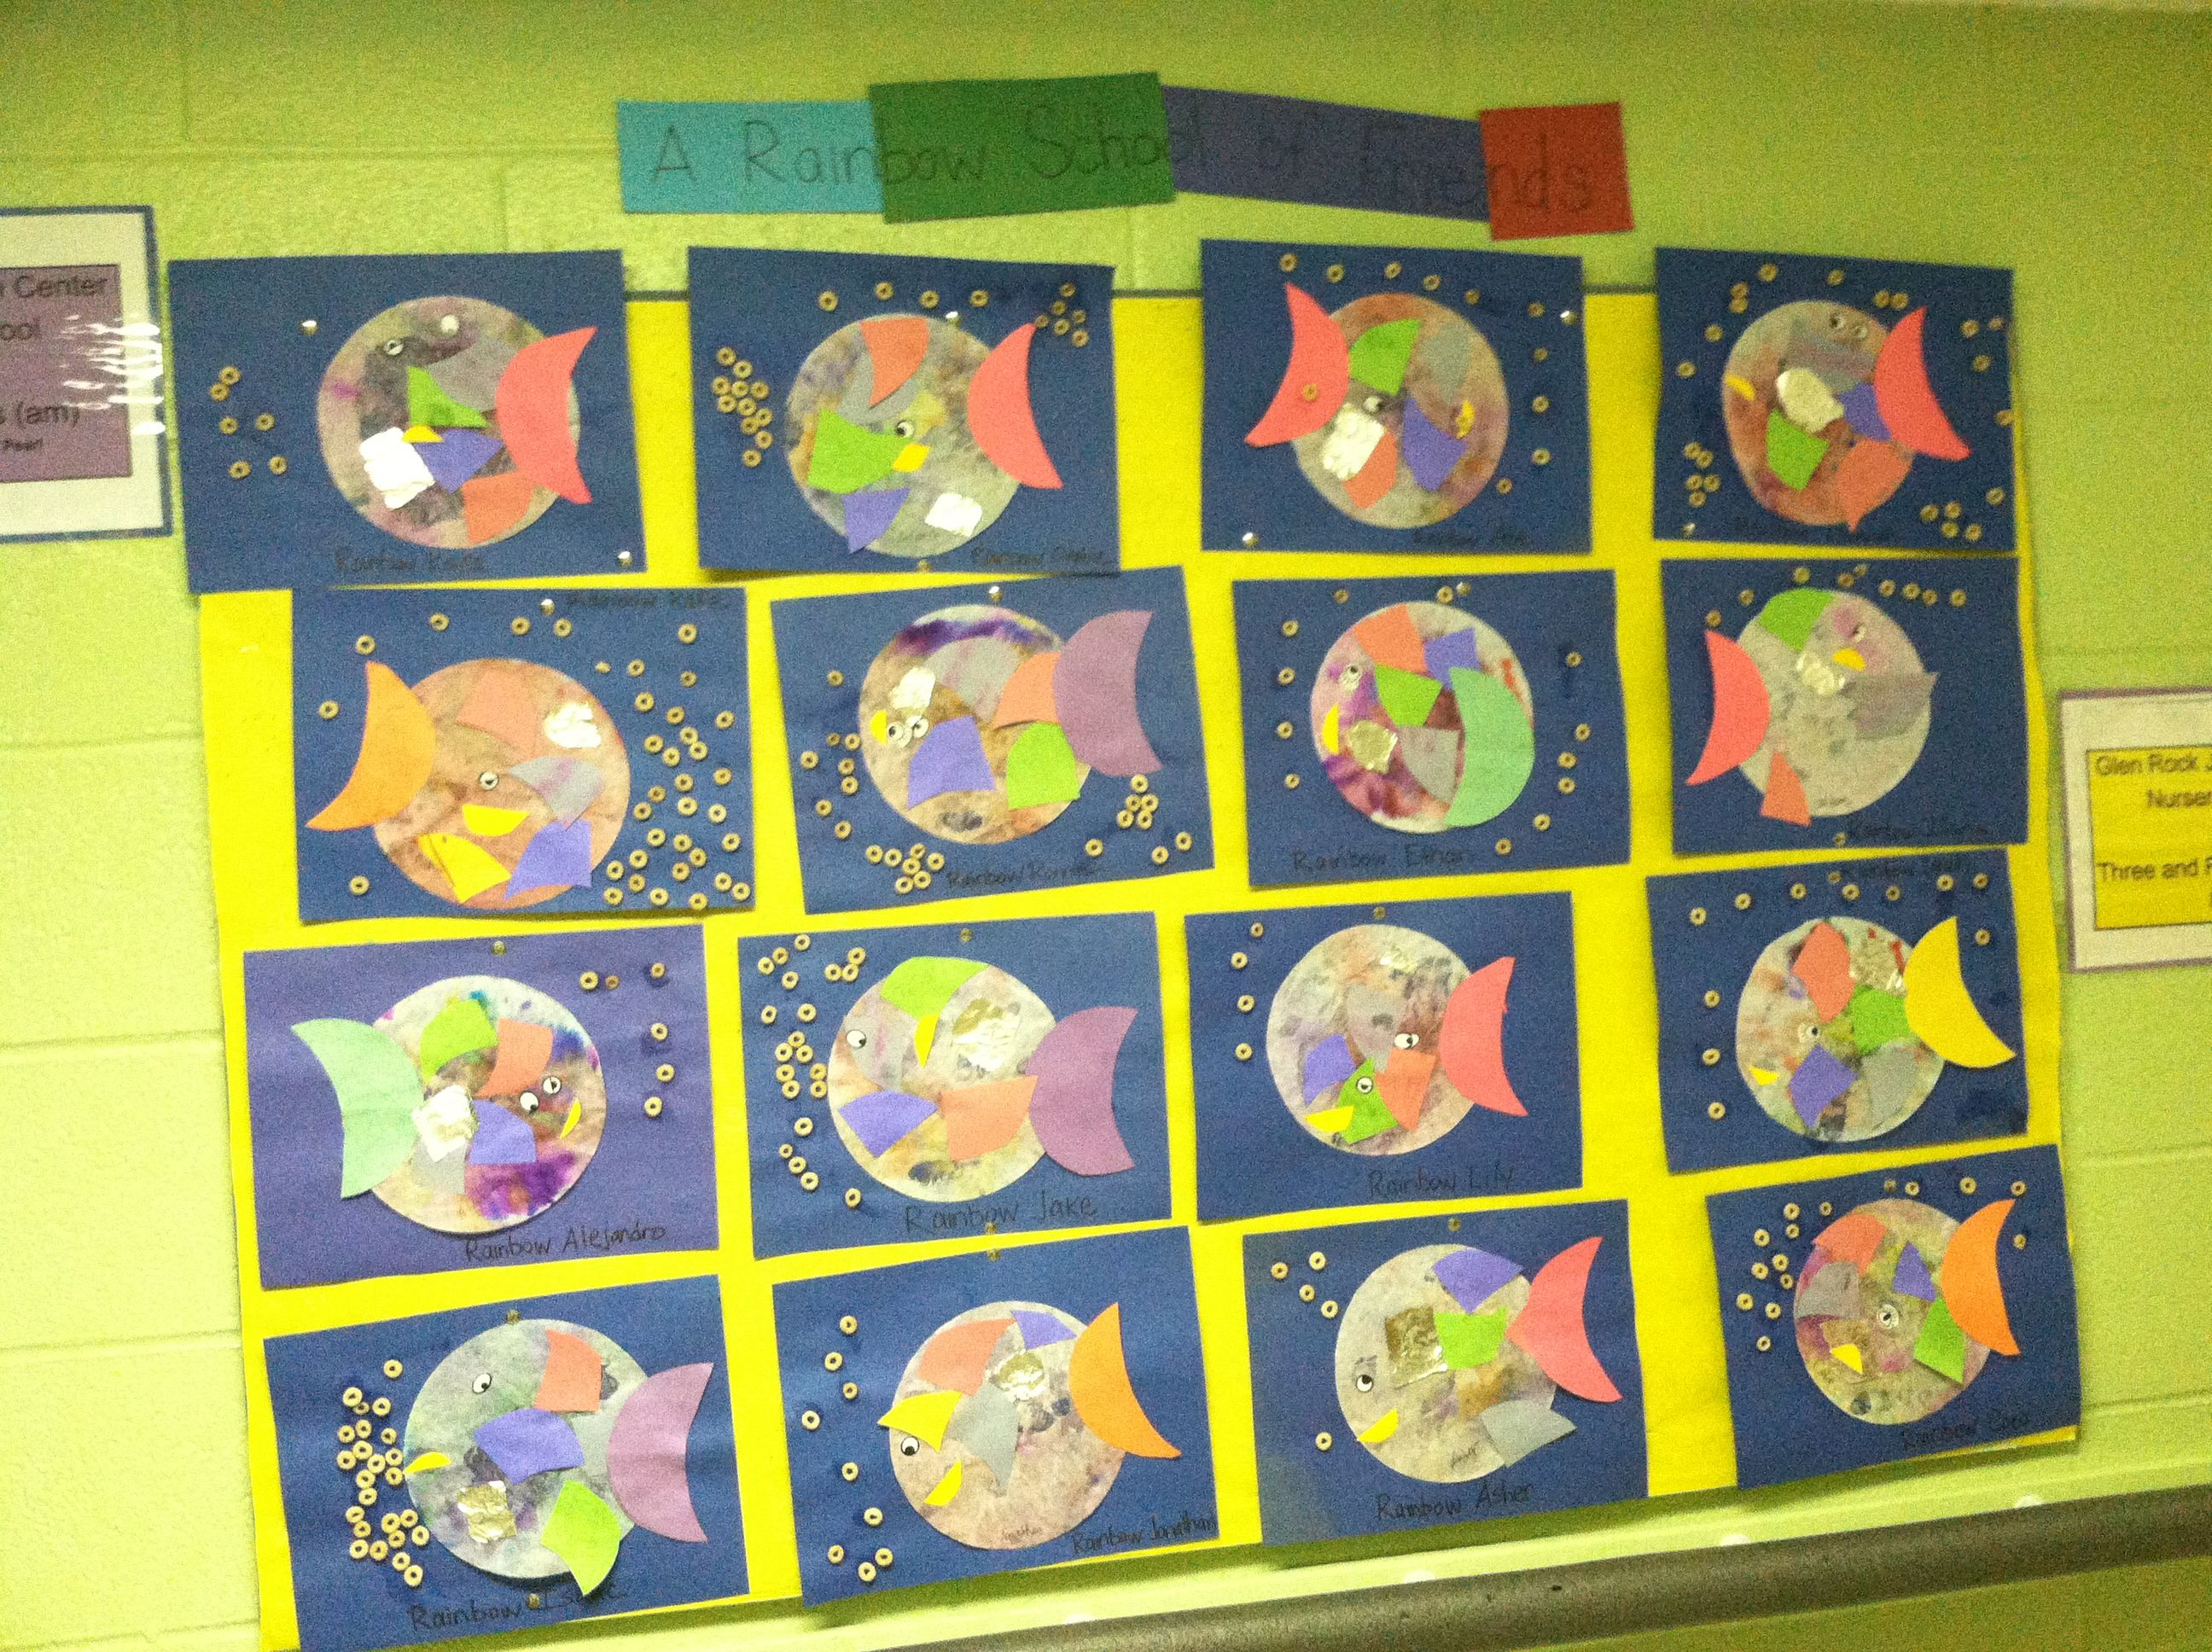 Preschoolers Explore Rainbow Fish Friendship With Images